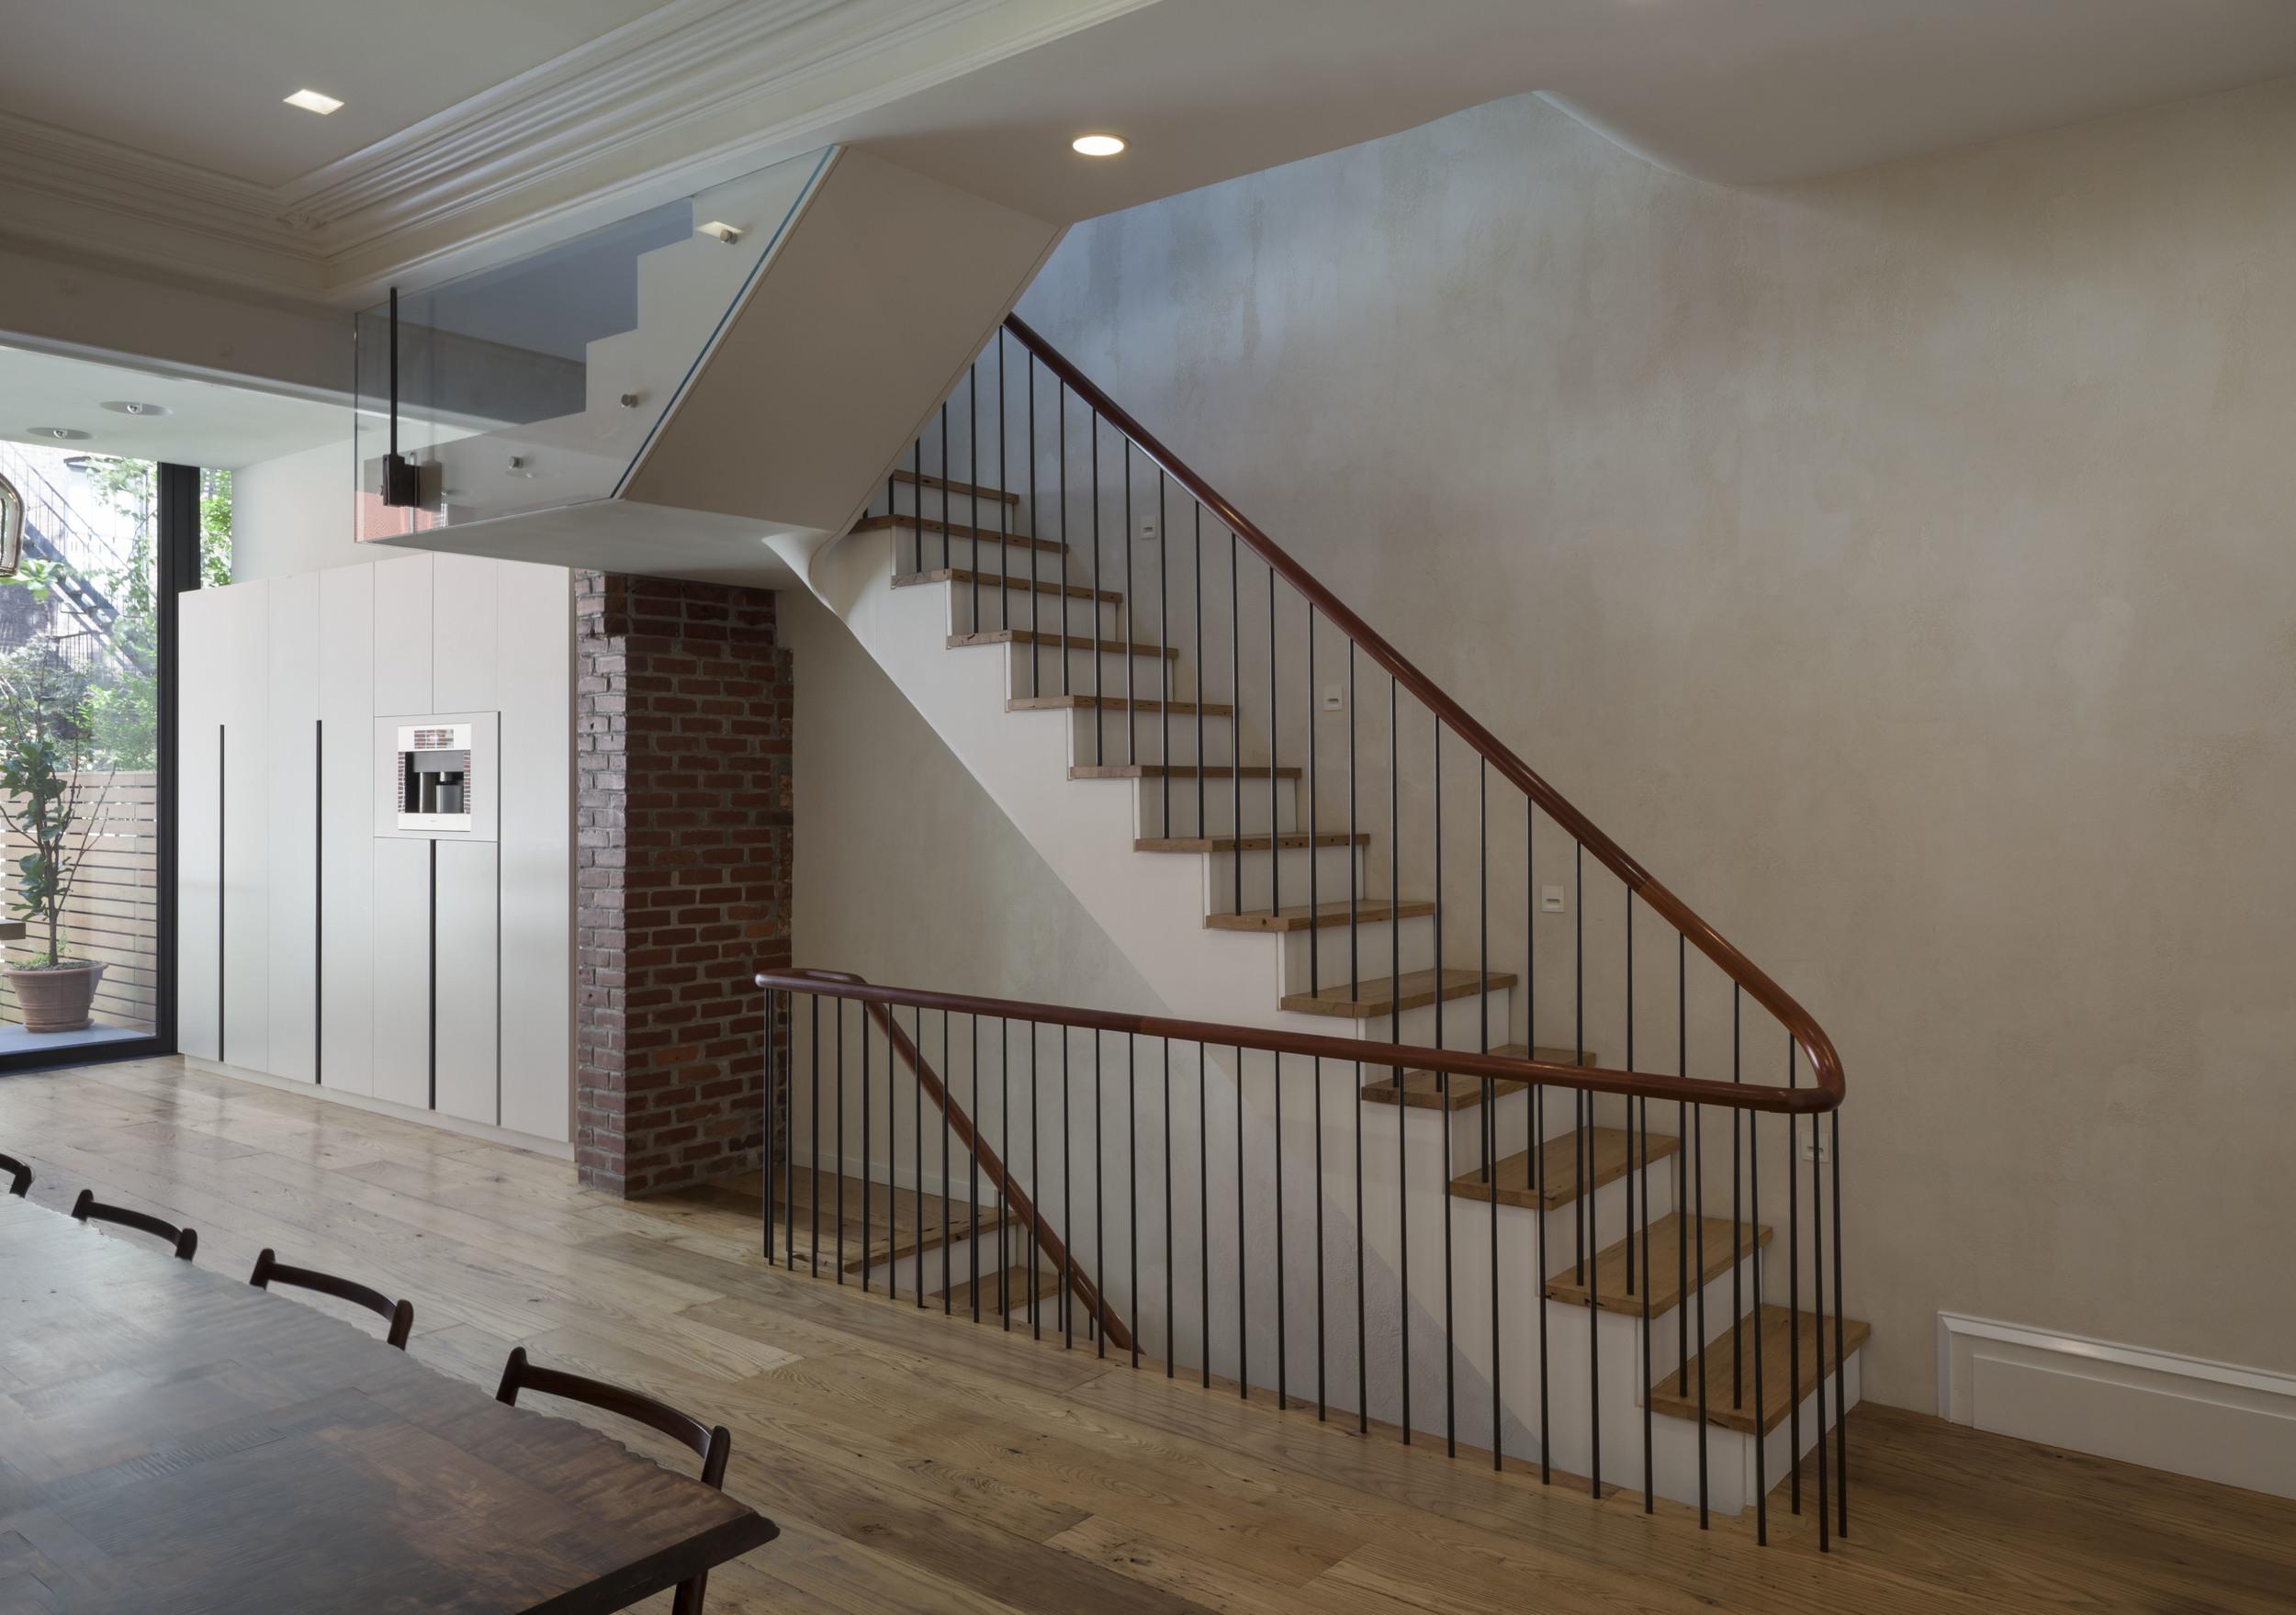 04 VAN_NY_ResidentialArchitecture.jpg